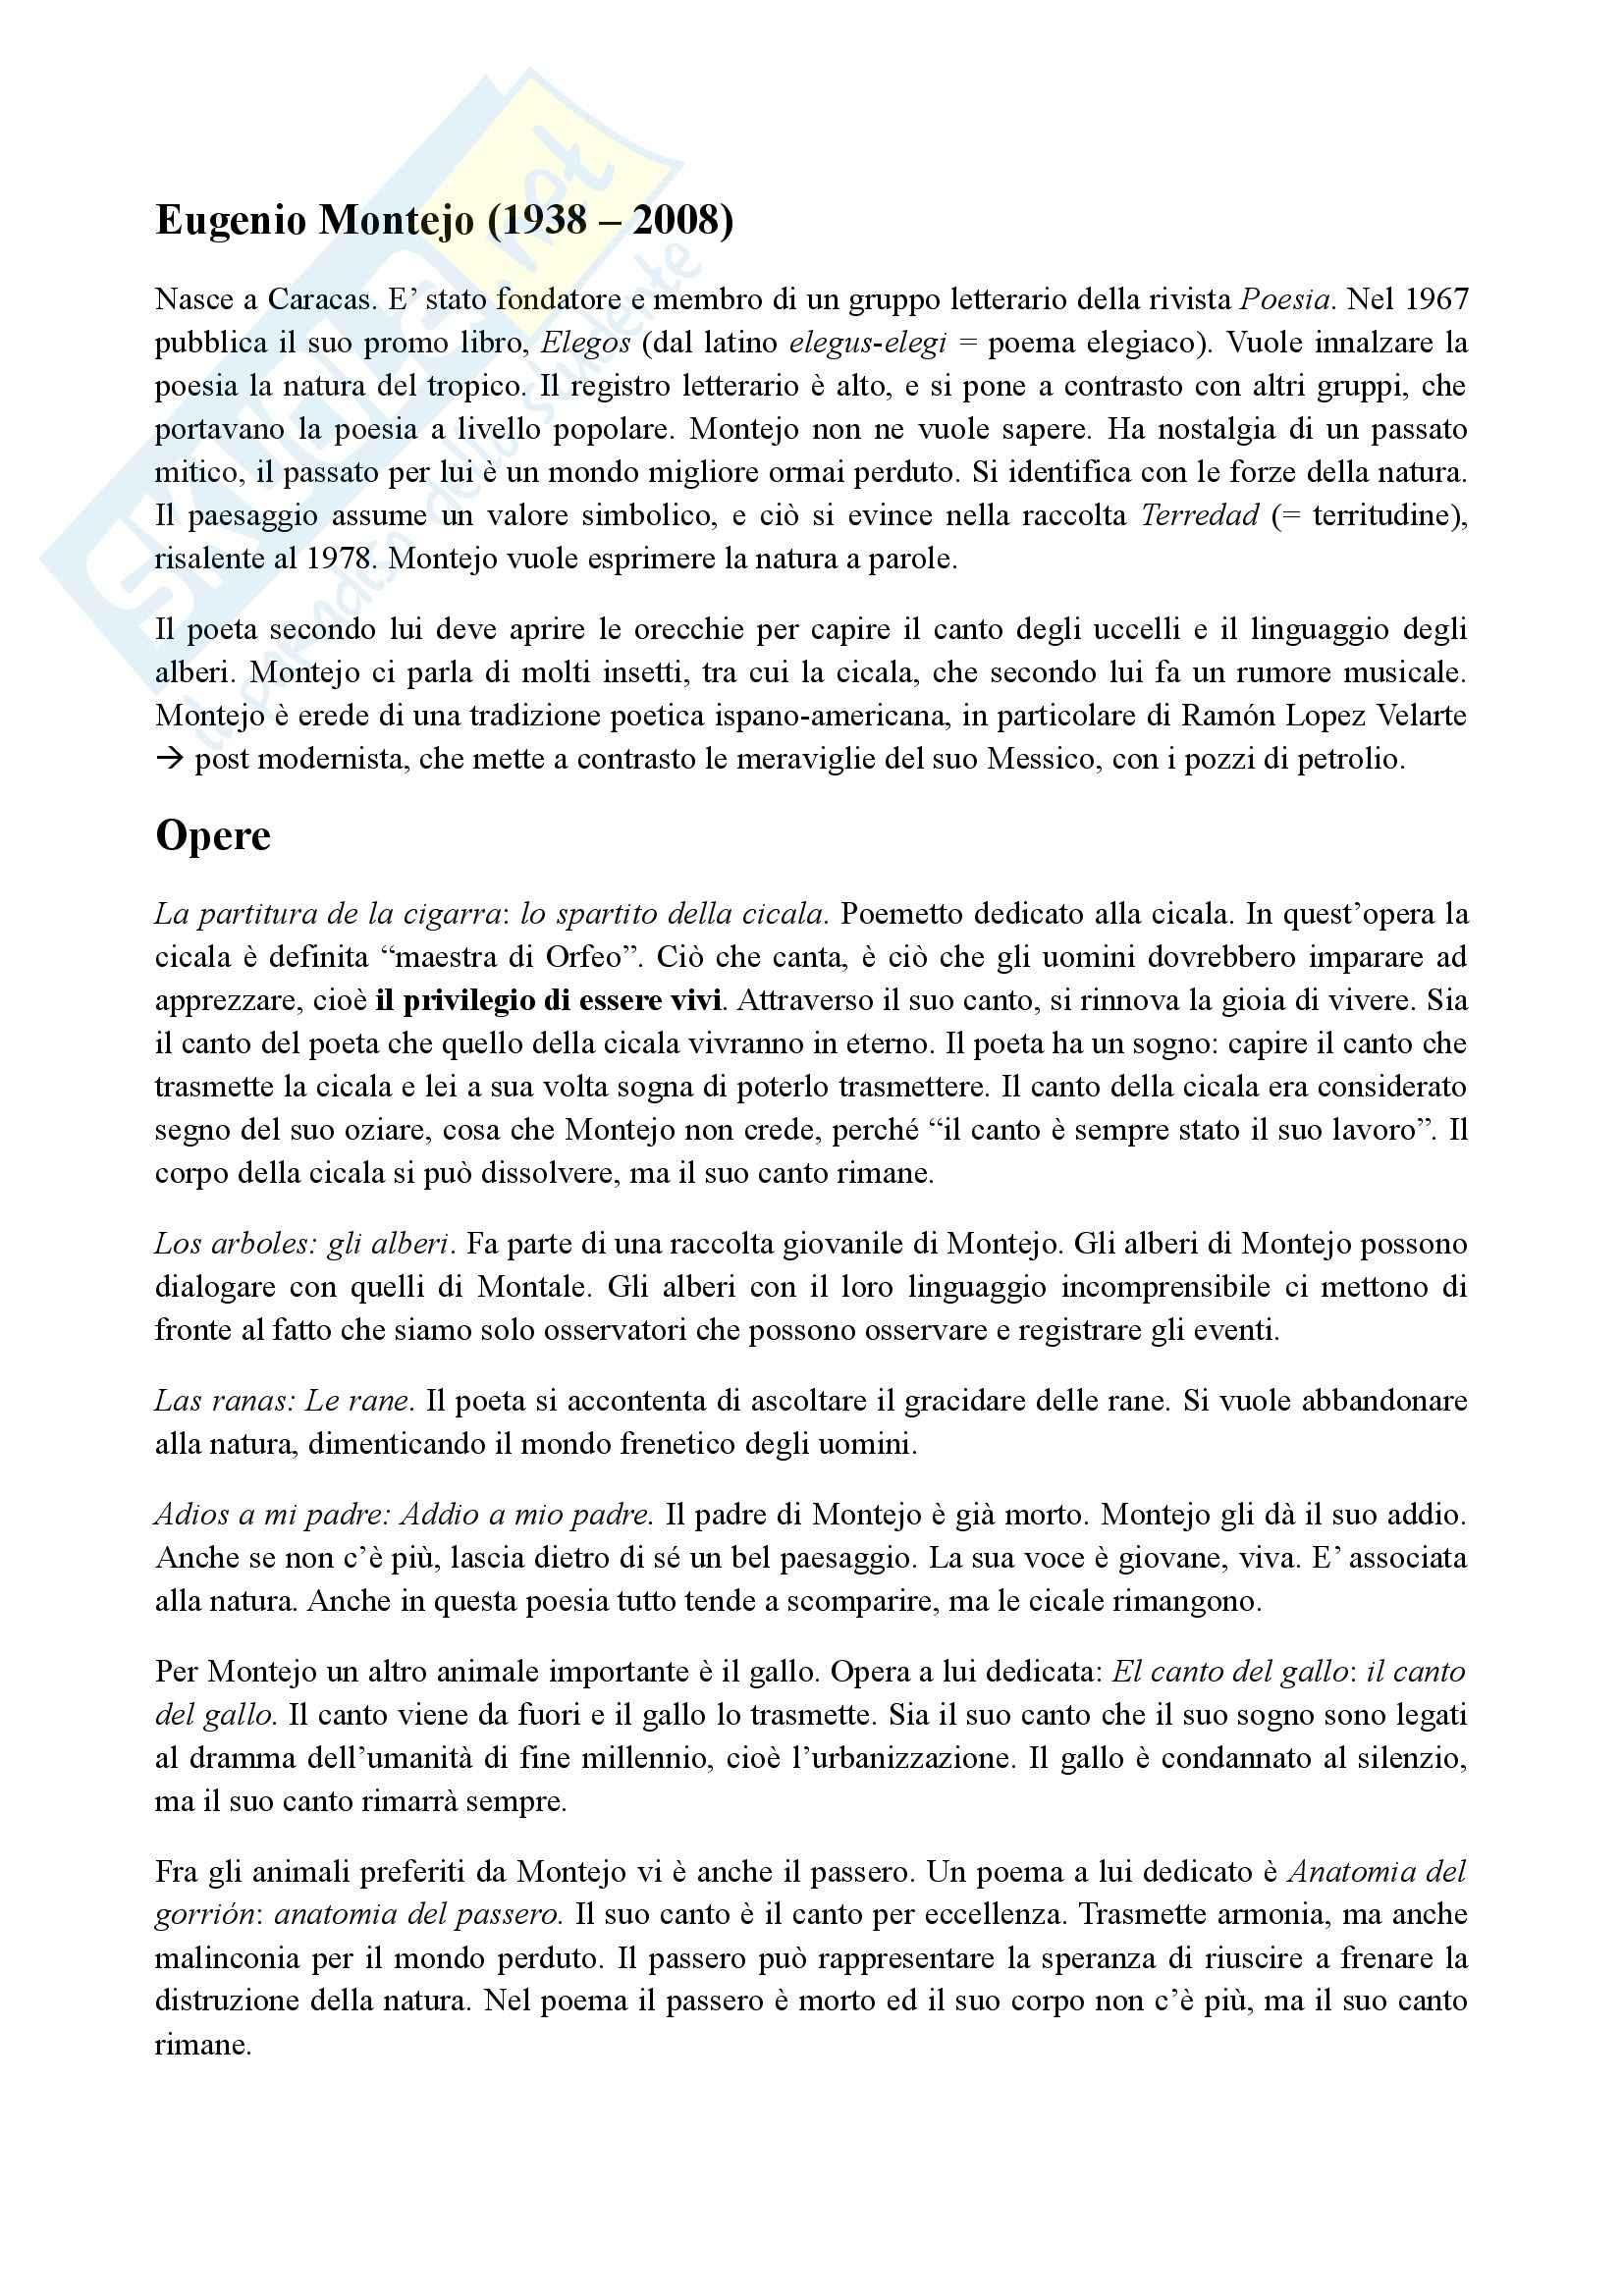 Eugenio Montejo - Vita ed opere